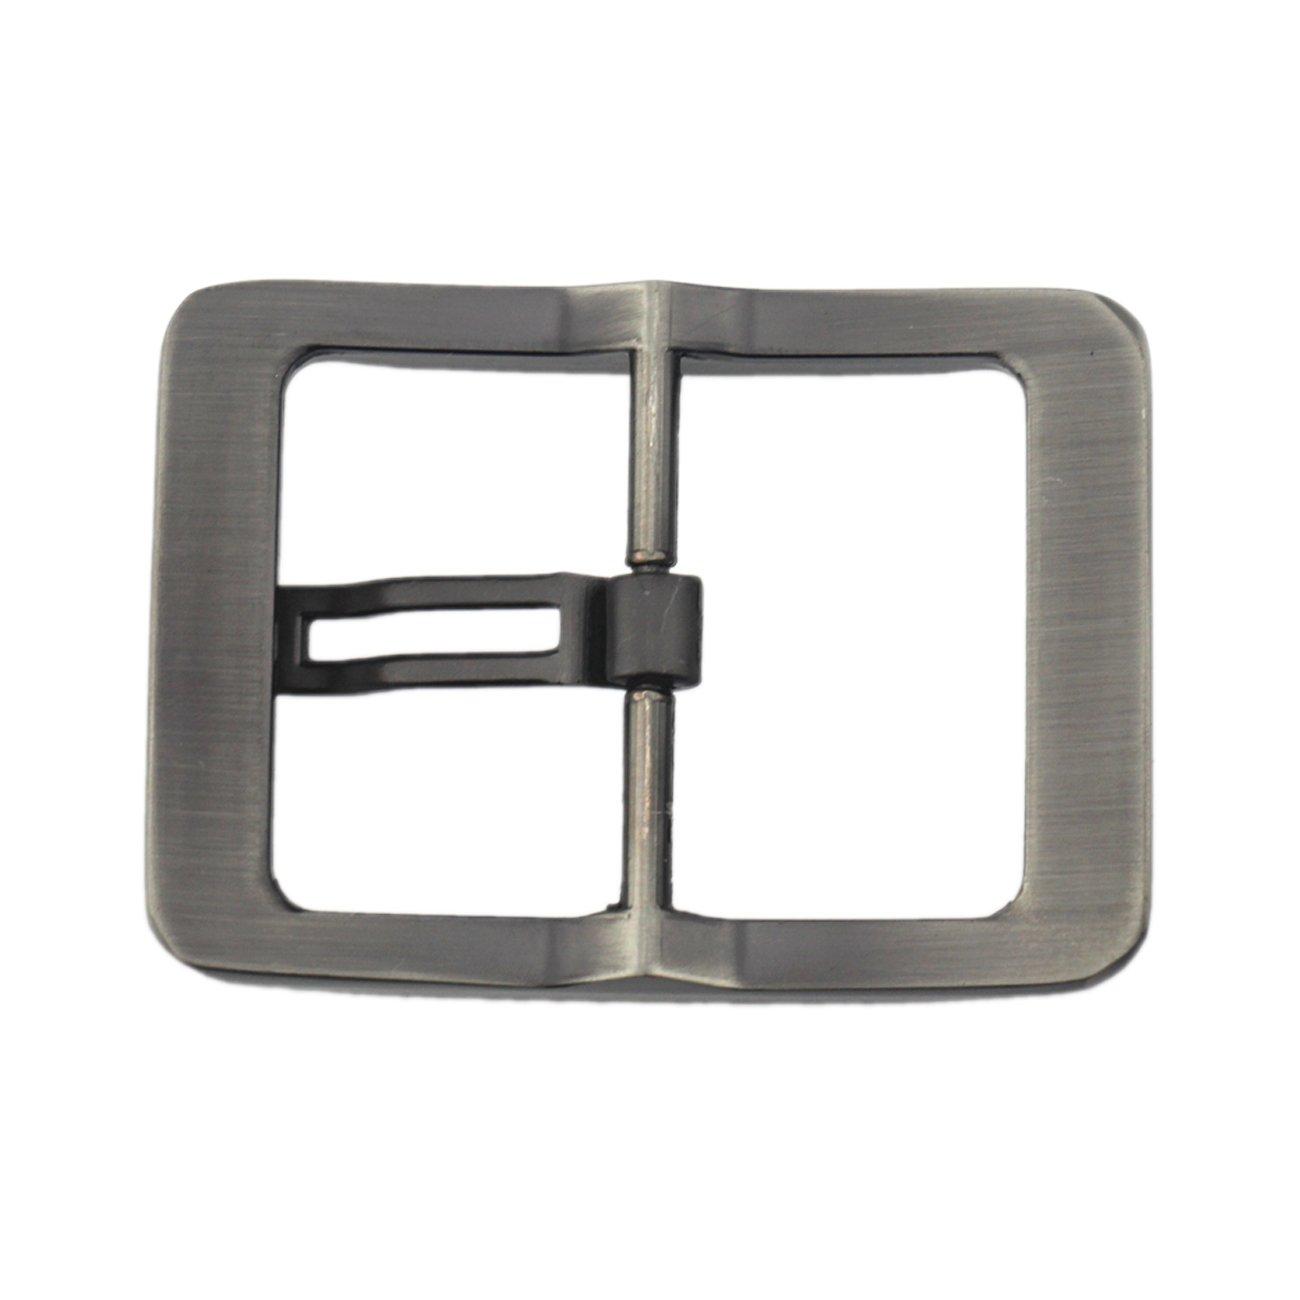 Gray05 38-40 mm Single Prong Square Belt Buckle Waistbelt buckle 1 1//2